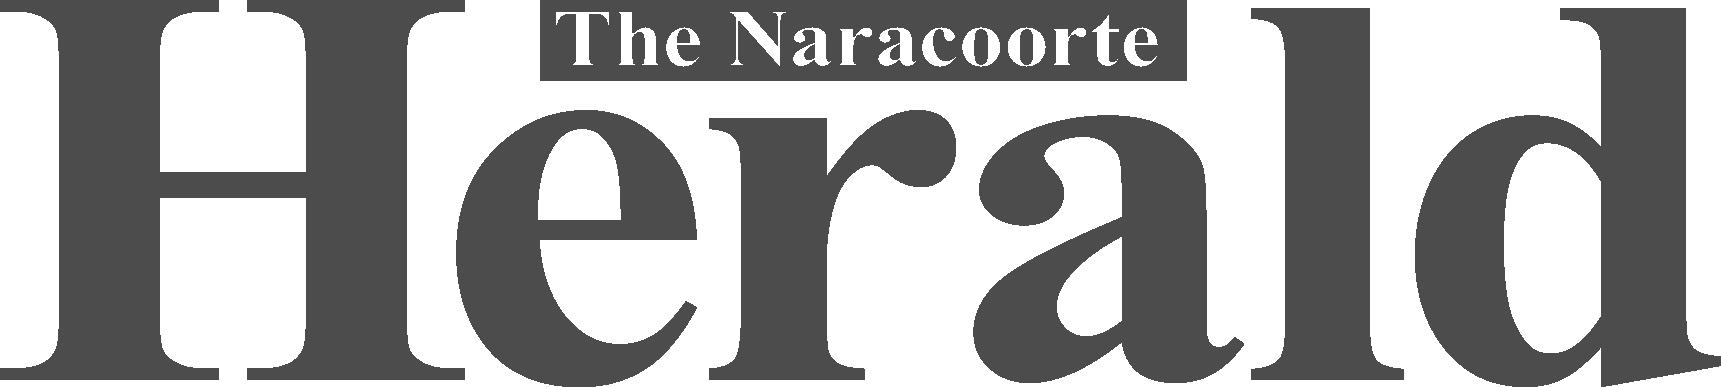 Naracoorte Herald